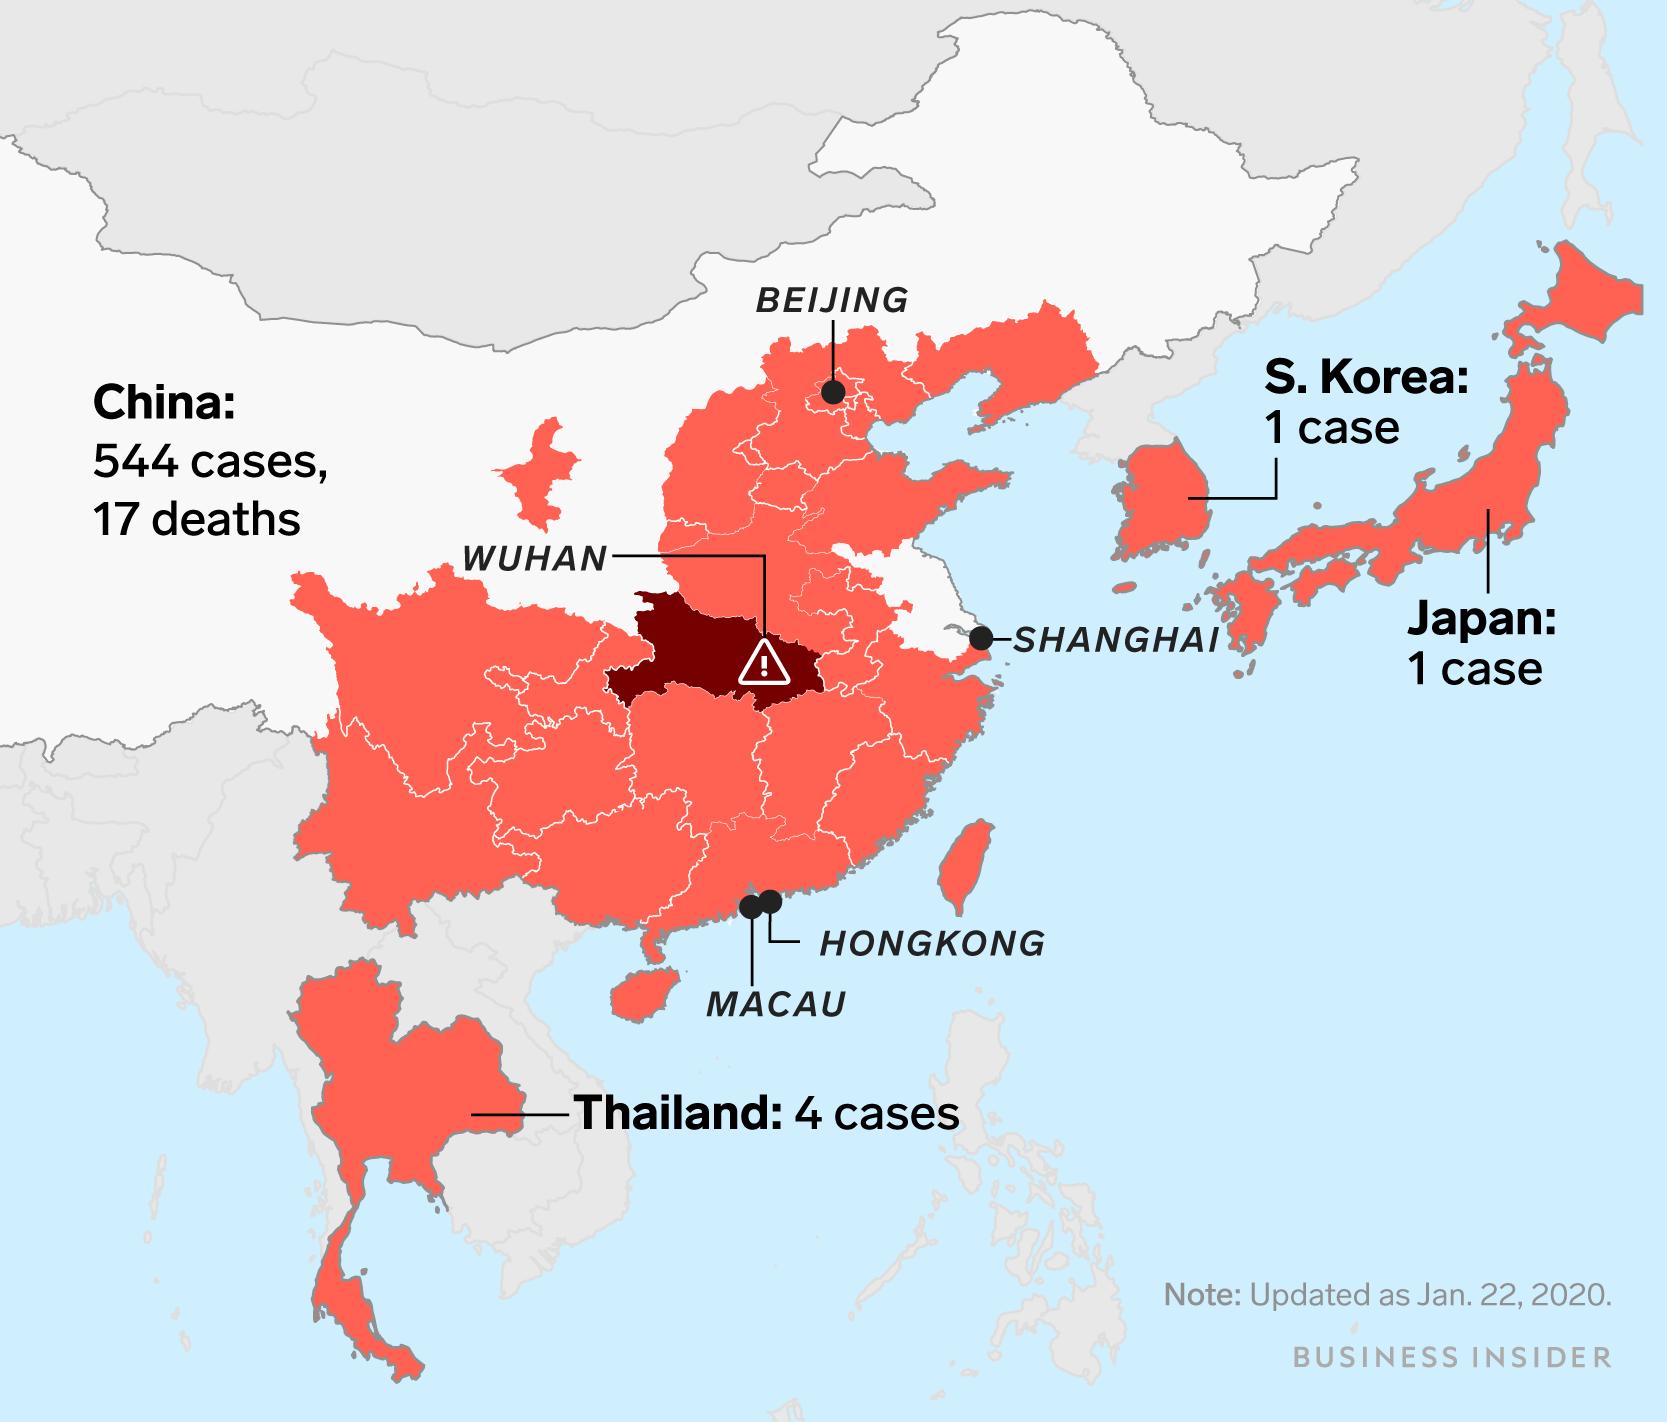 Here Are The Symptoms Of The Wuhan Coronavirus According